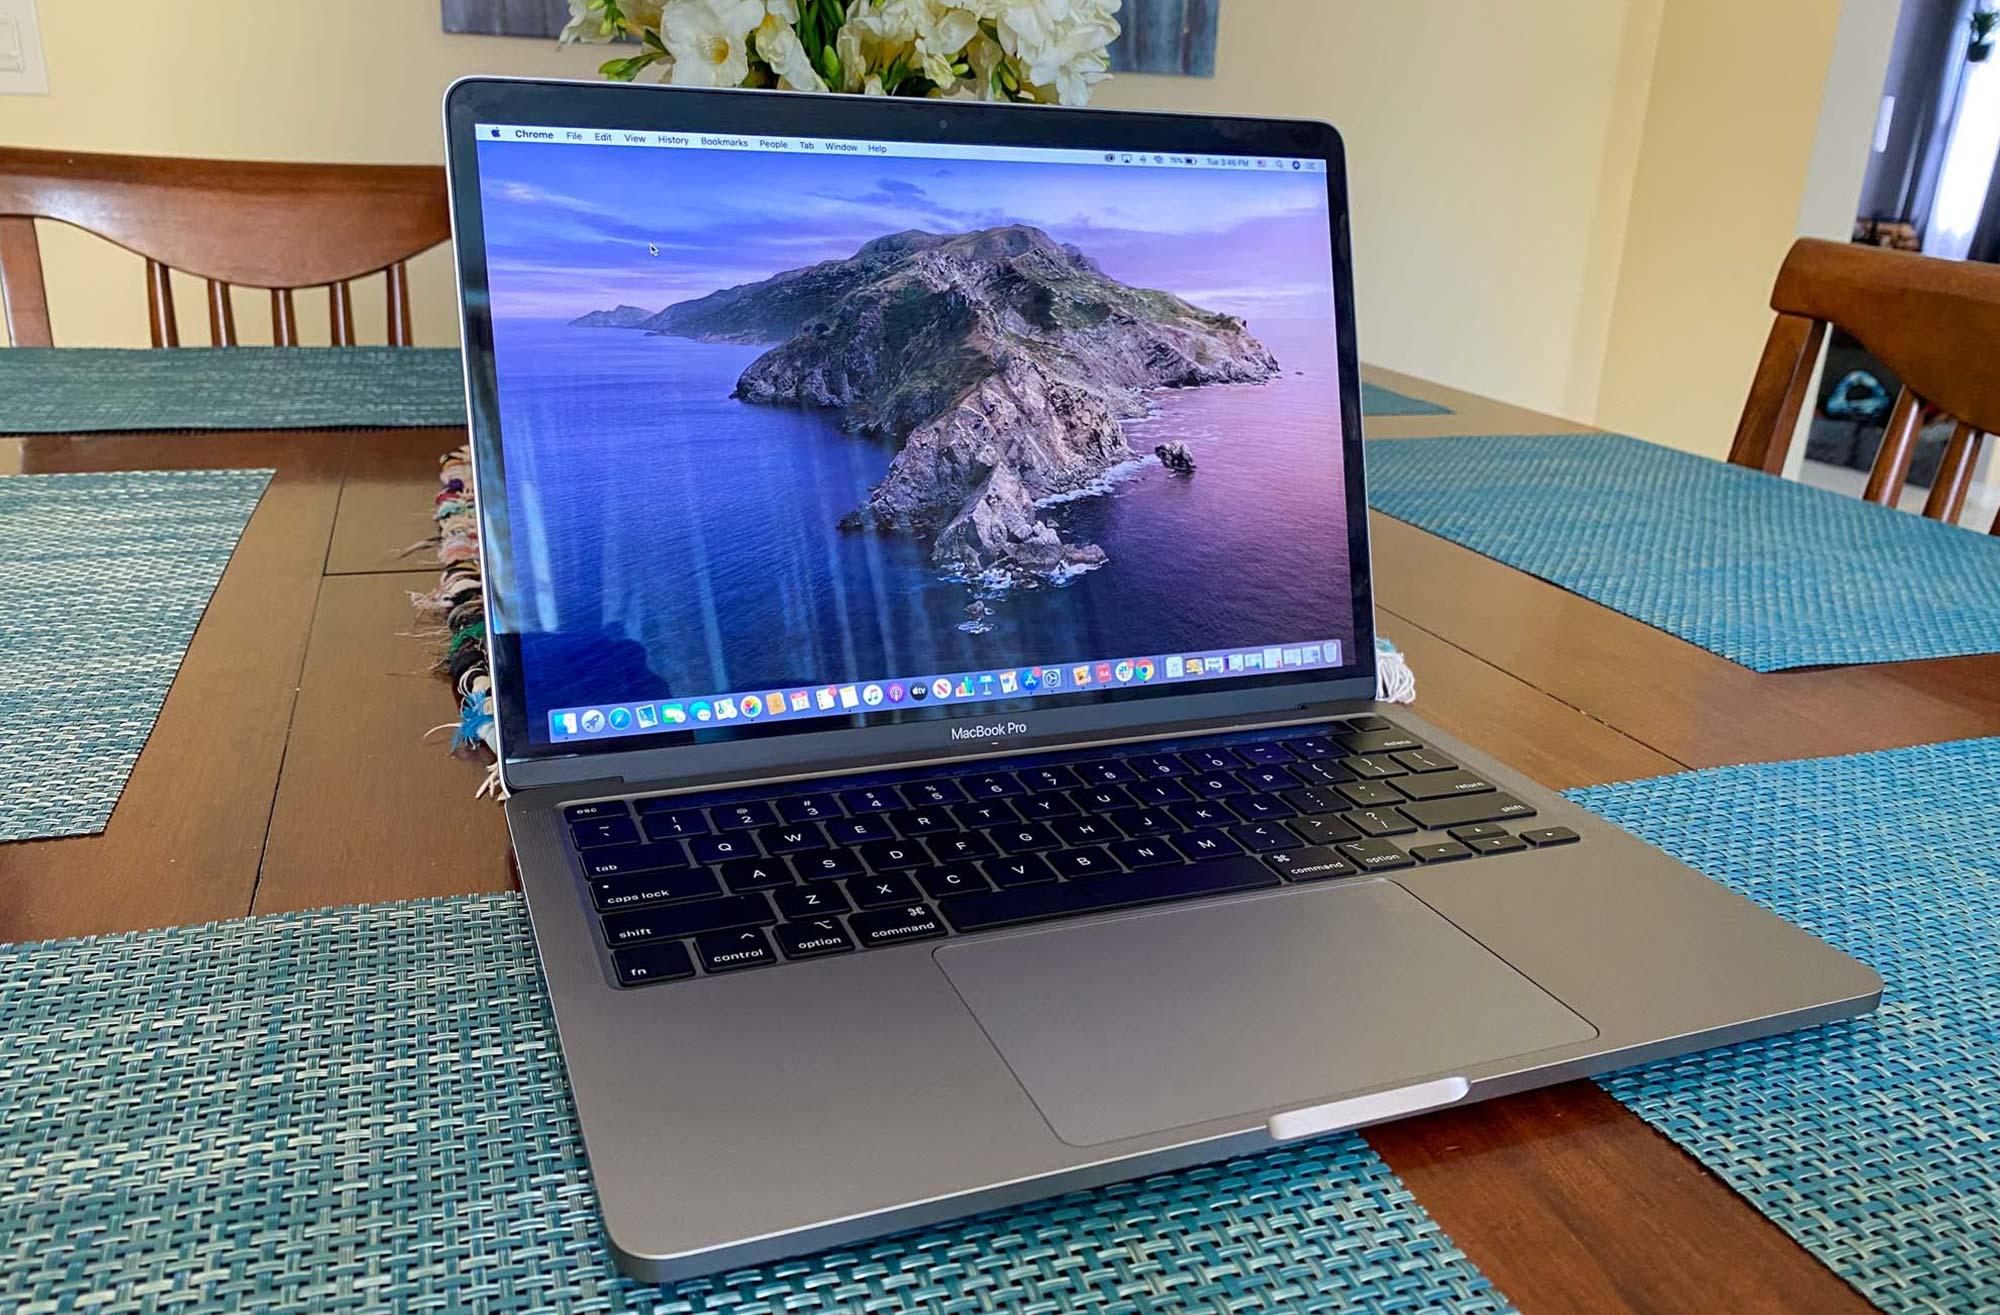 Dell XPS 13 vs MacBook Pro - MacBook Pro at table